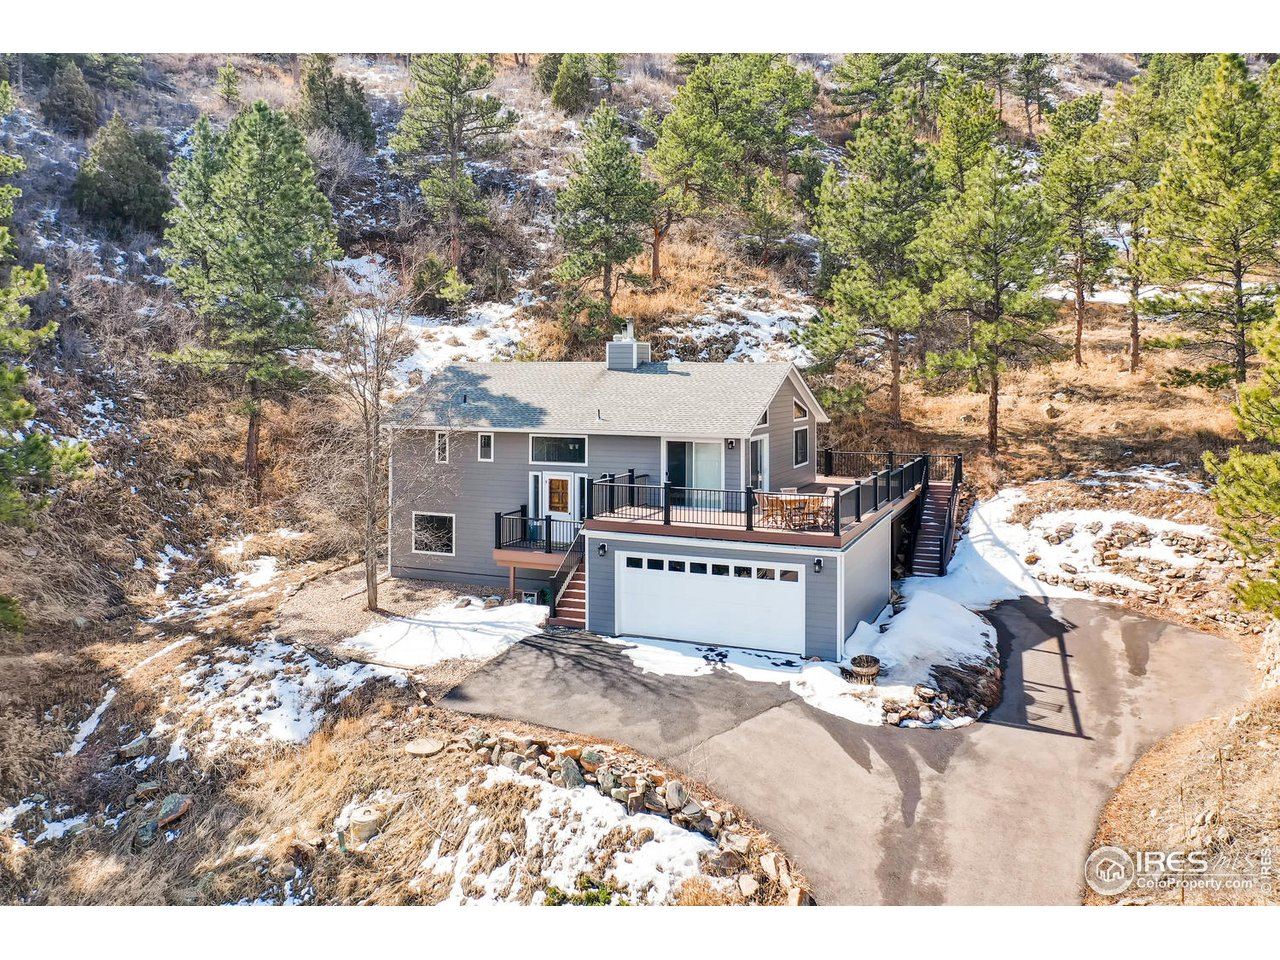 2700 Crestridge Ct, Boulder CO 80302